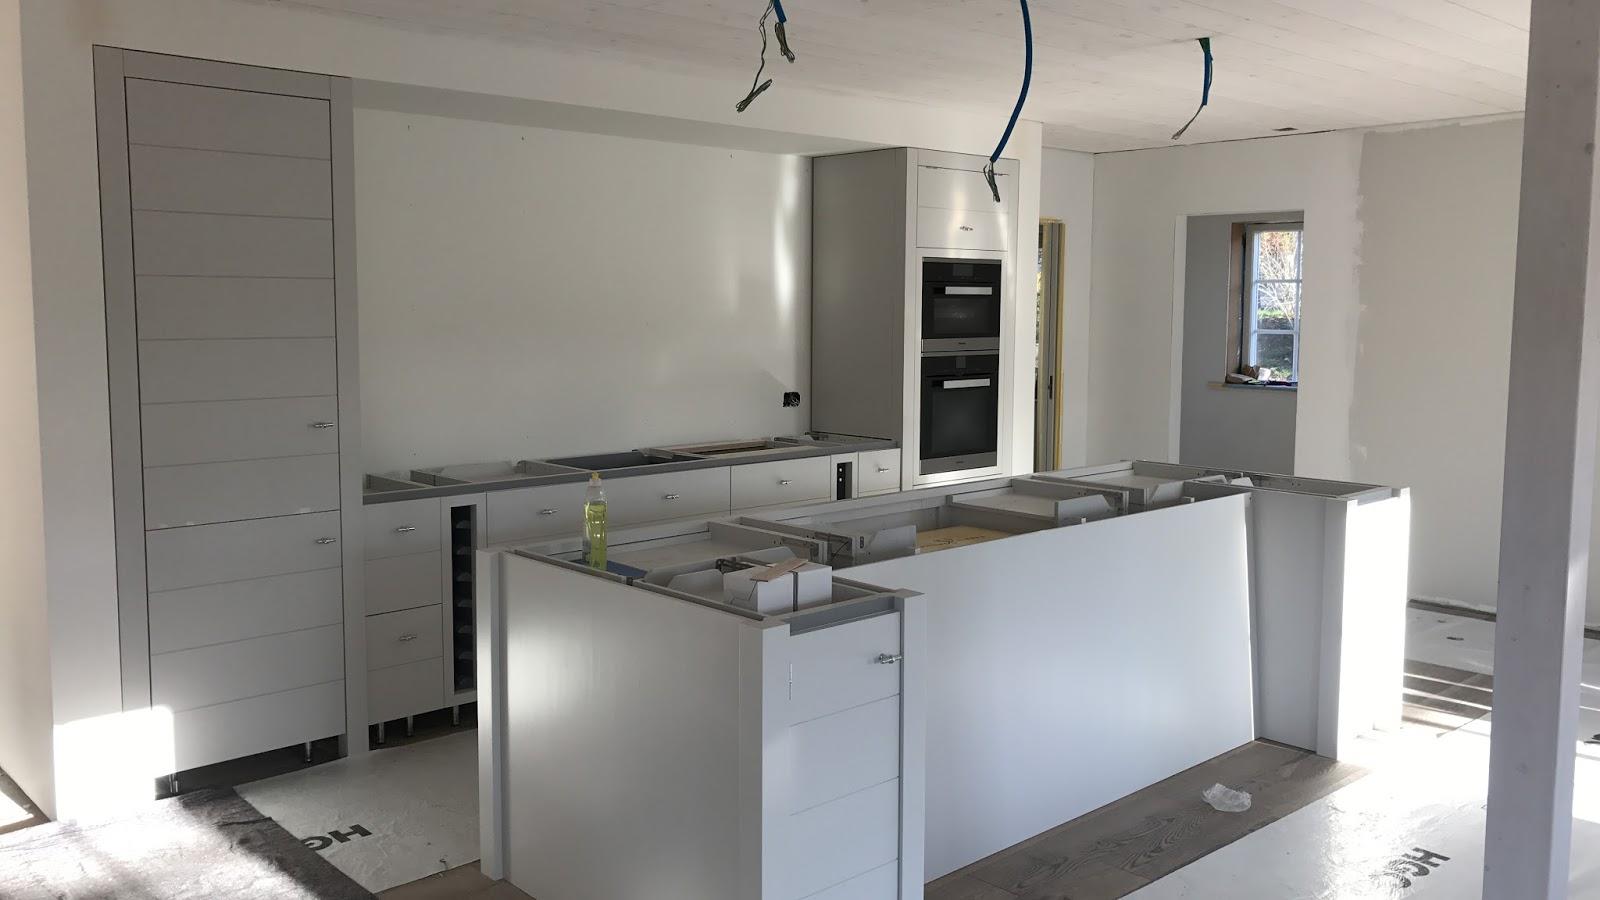 Einbau unserer Neptune Küche - Beachhouse Living